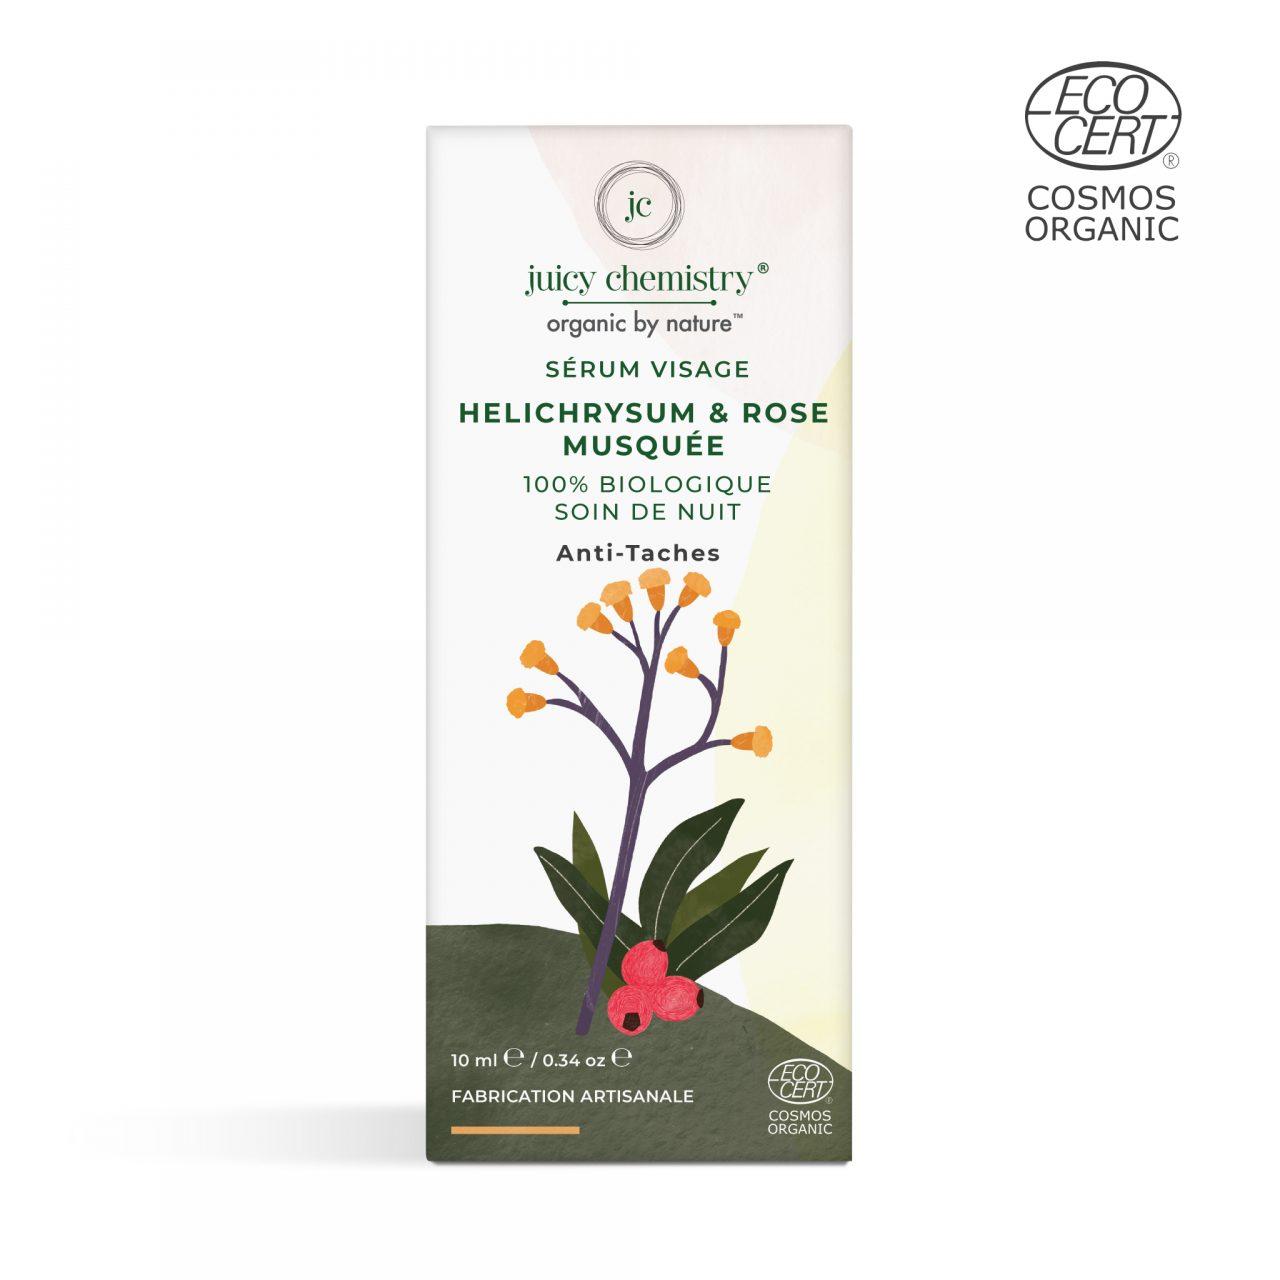 Sérum Visage Helichrysum & Rose musquée Recto